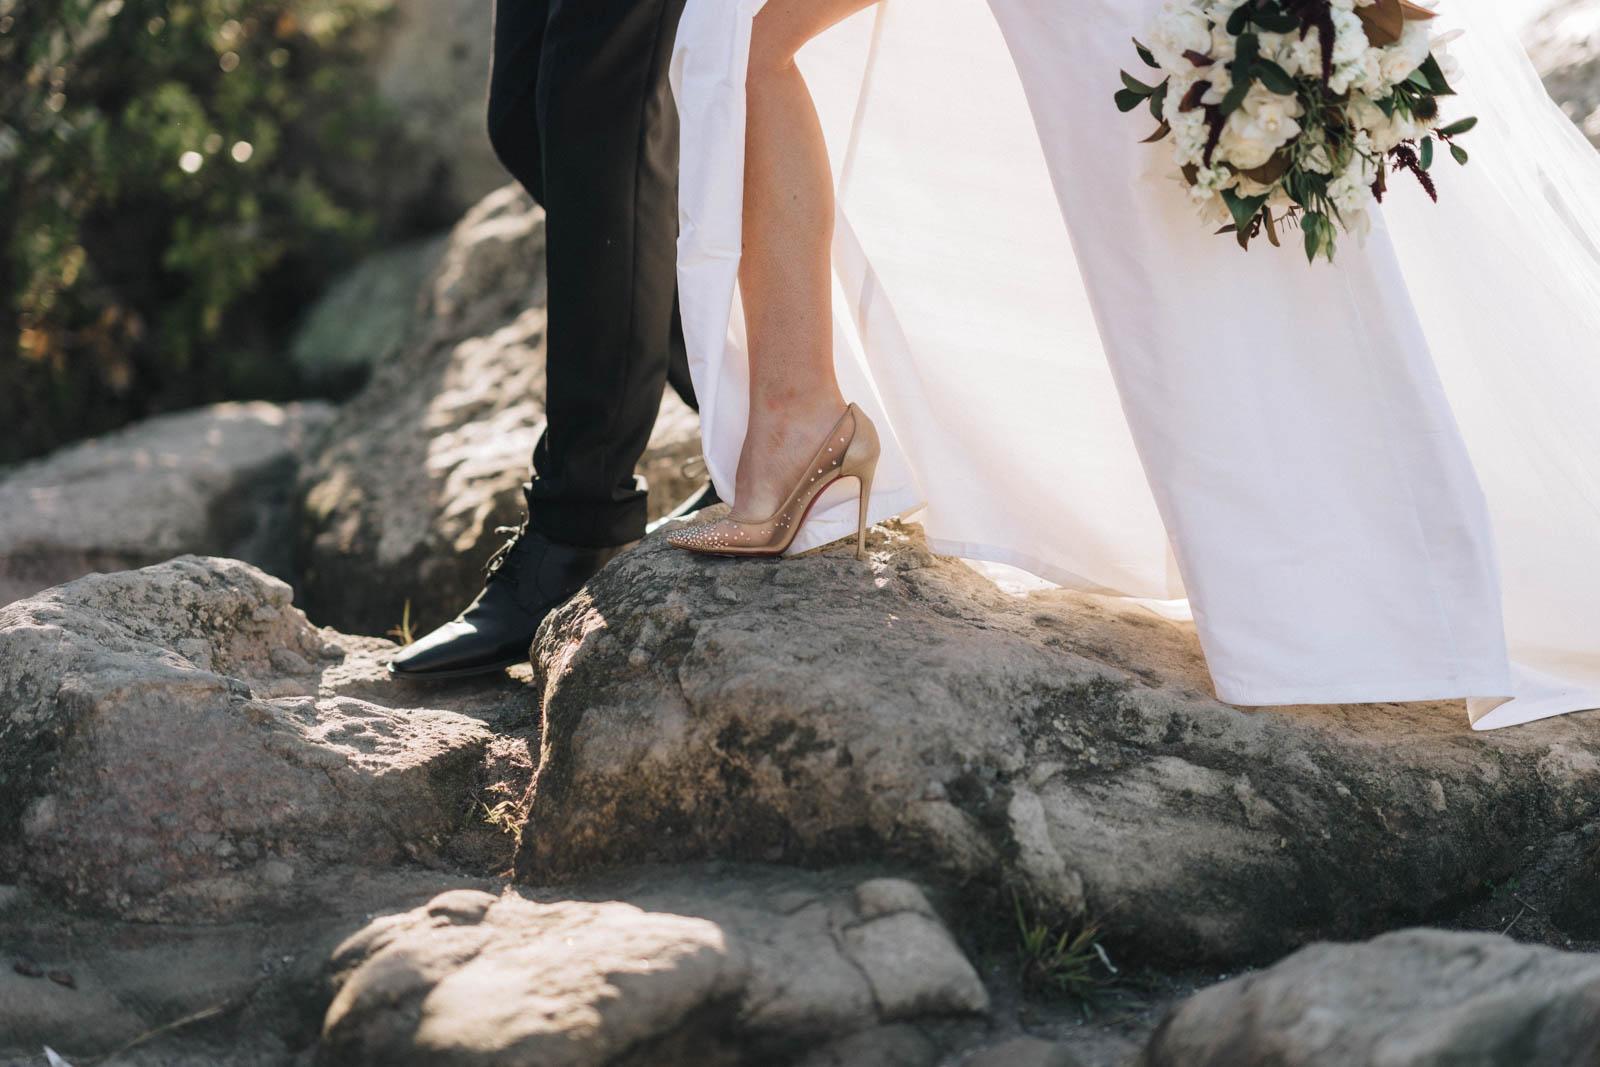 newfound-s-p-mt-maunganui-tauranga-wedding-photographer-1533-A9_05443